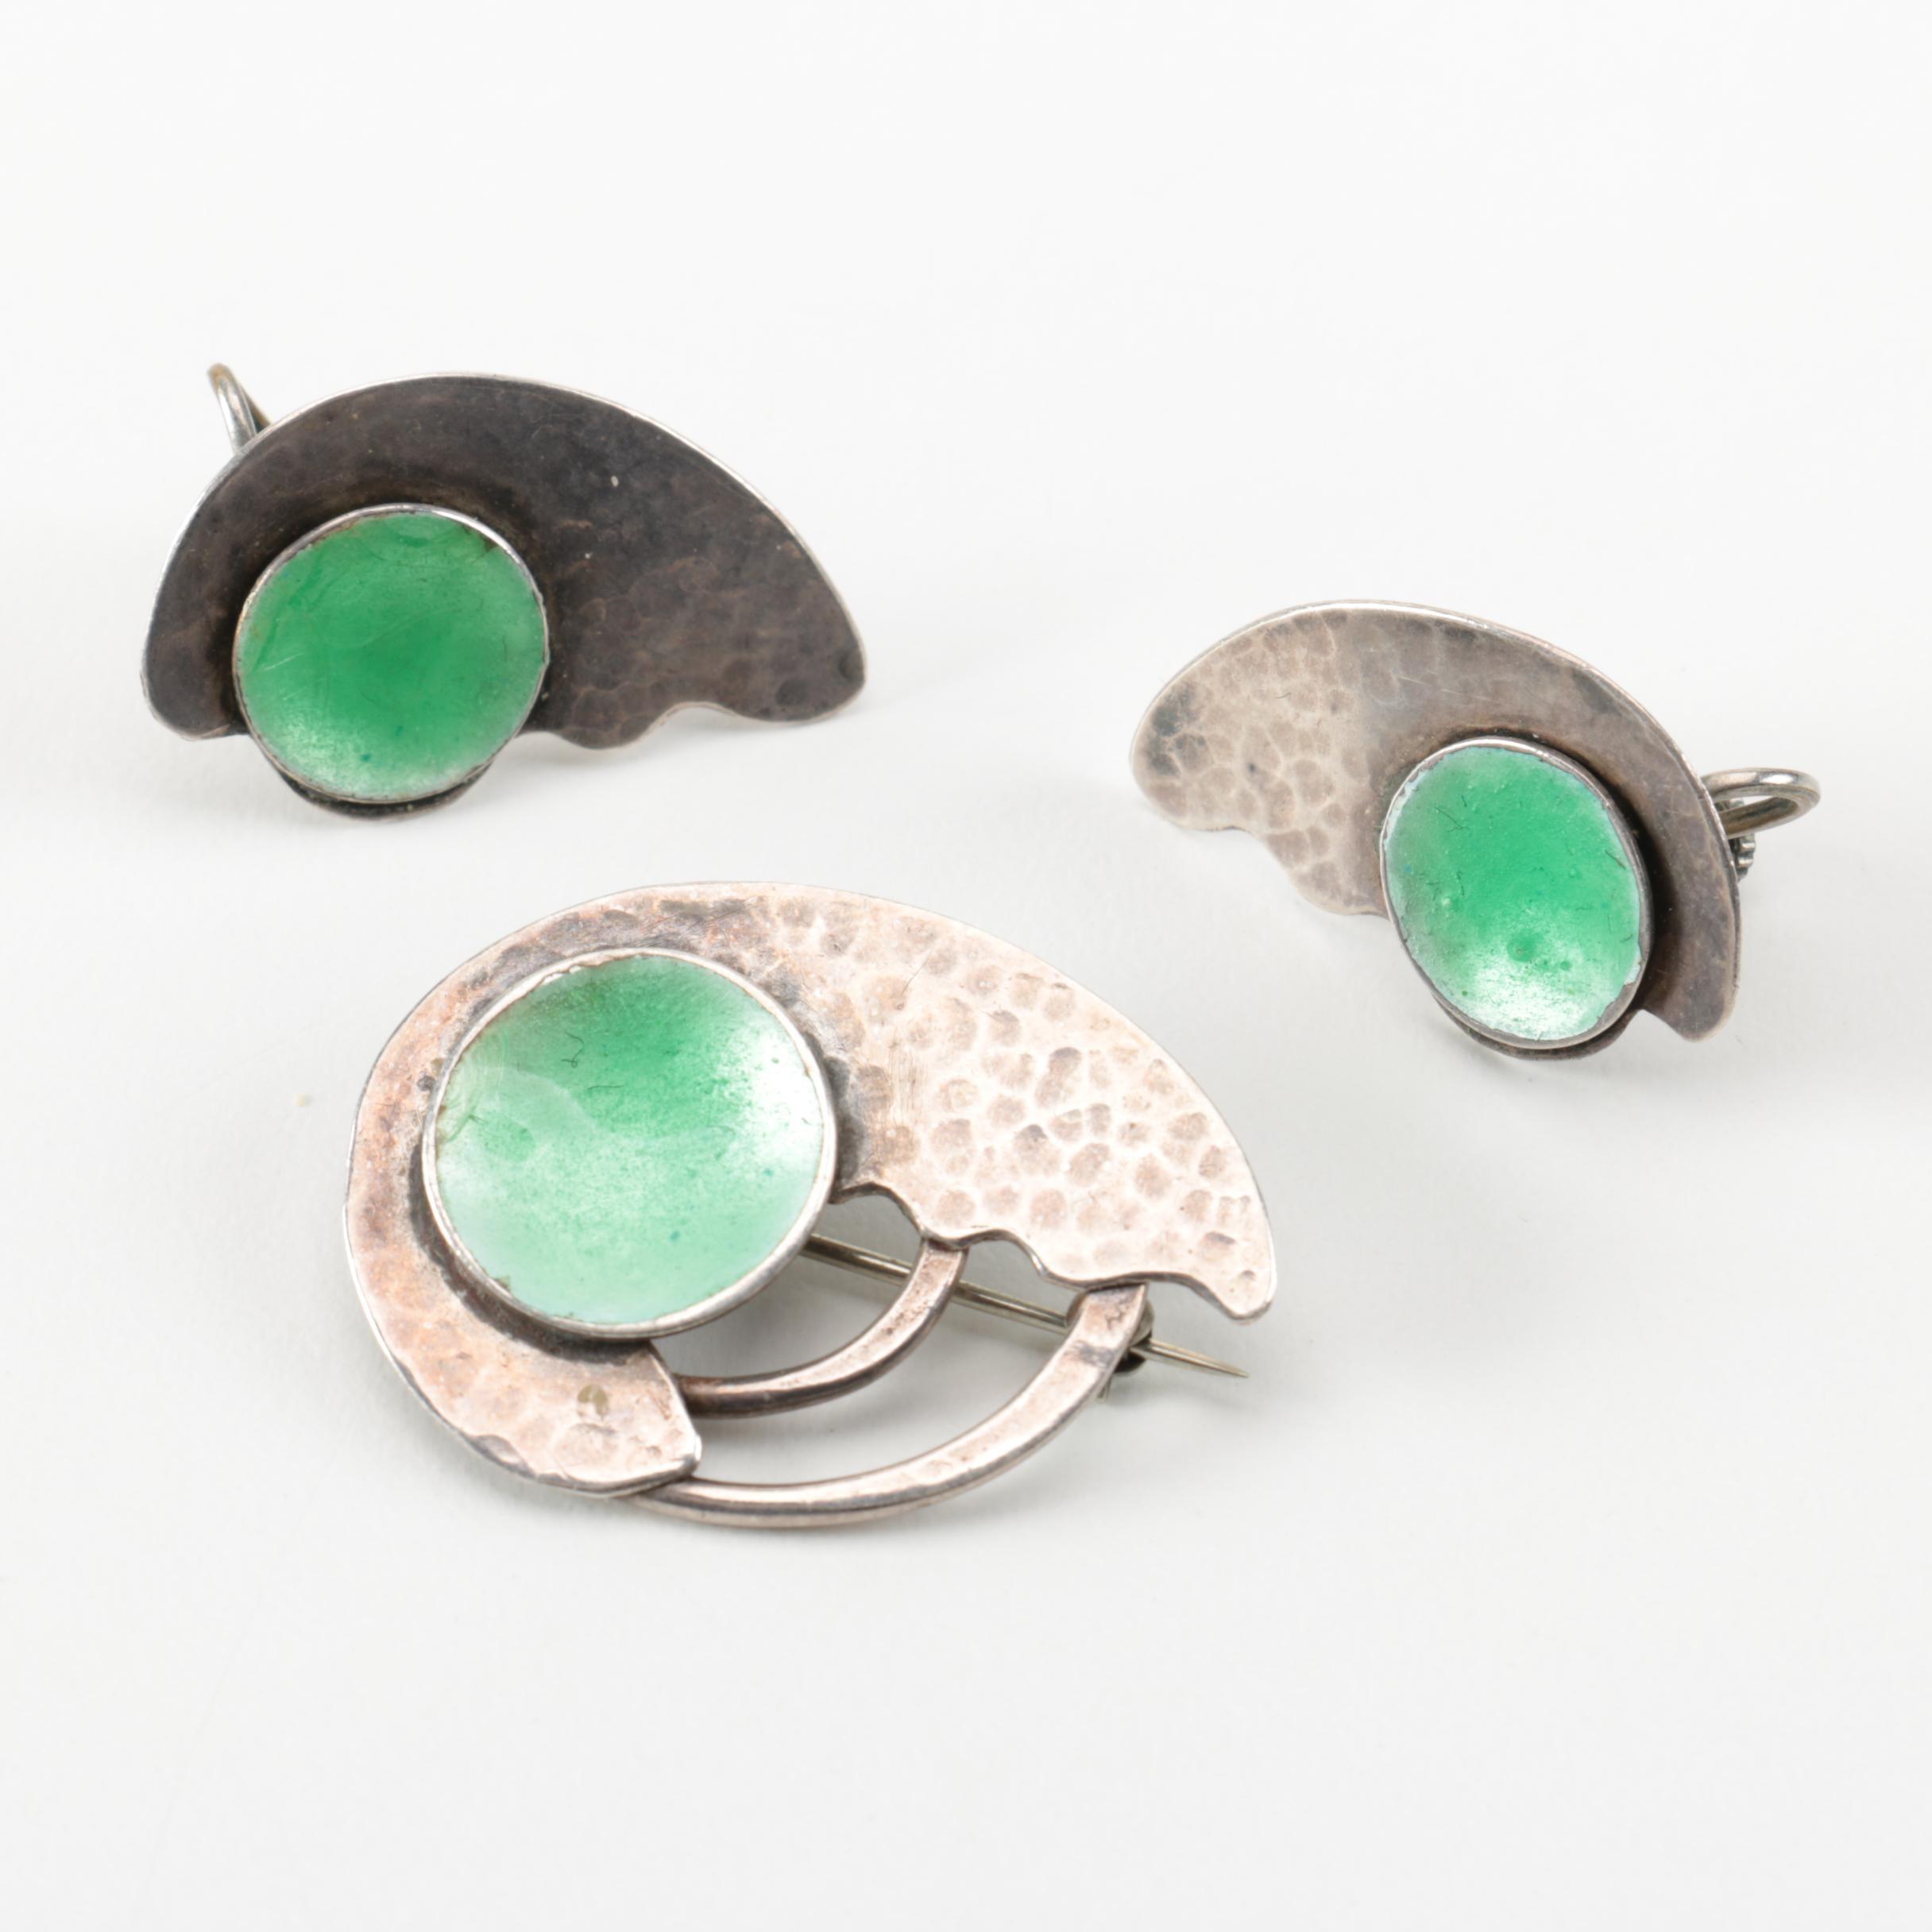 John Bryan Sterling Silver Brooch and Earrings